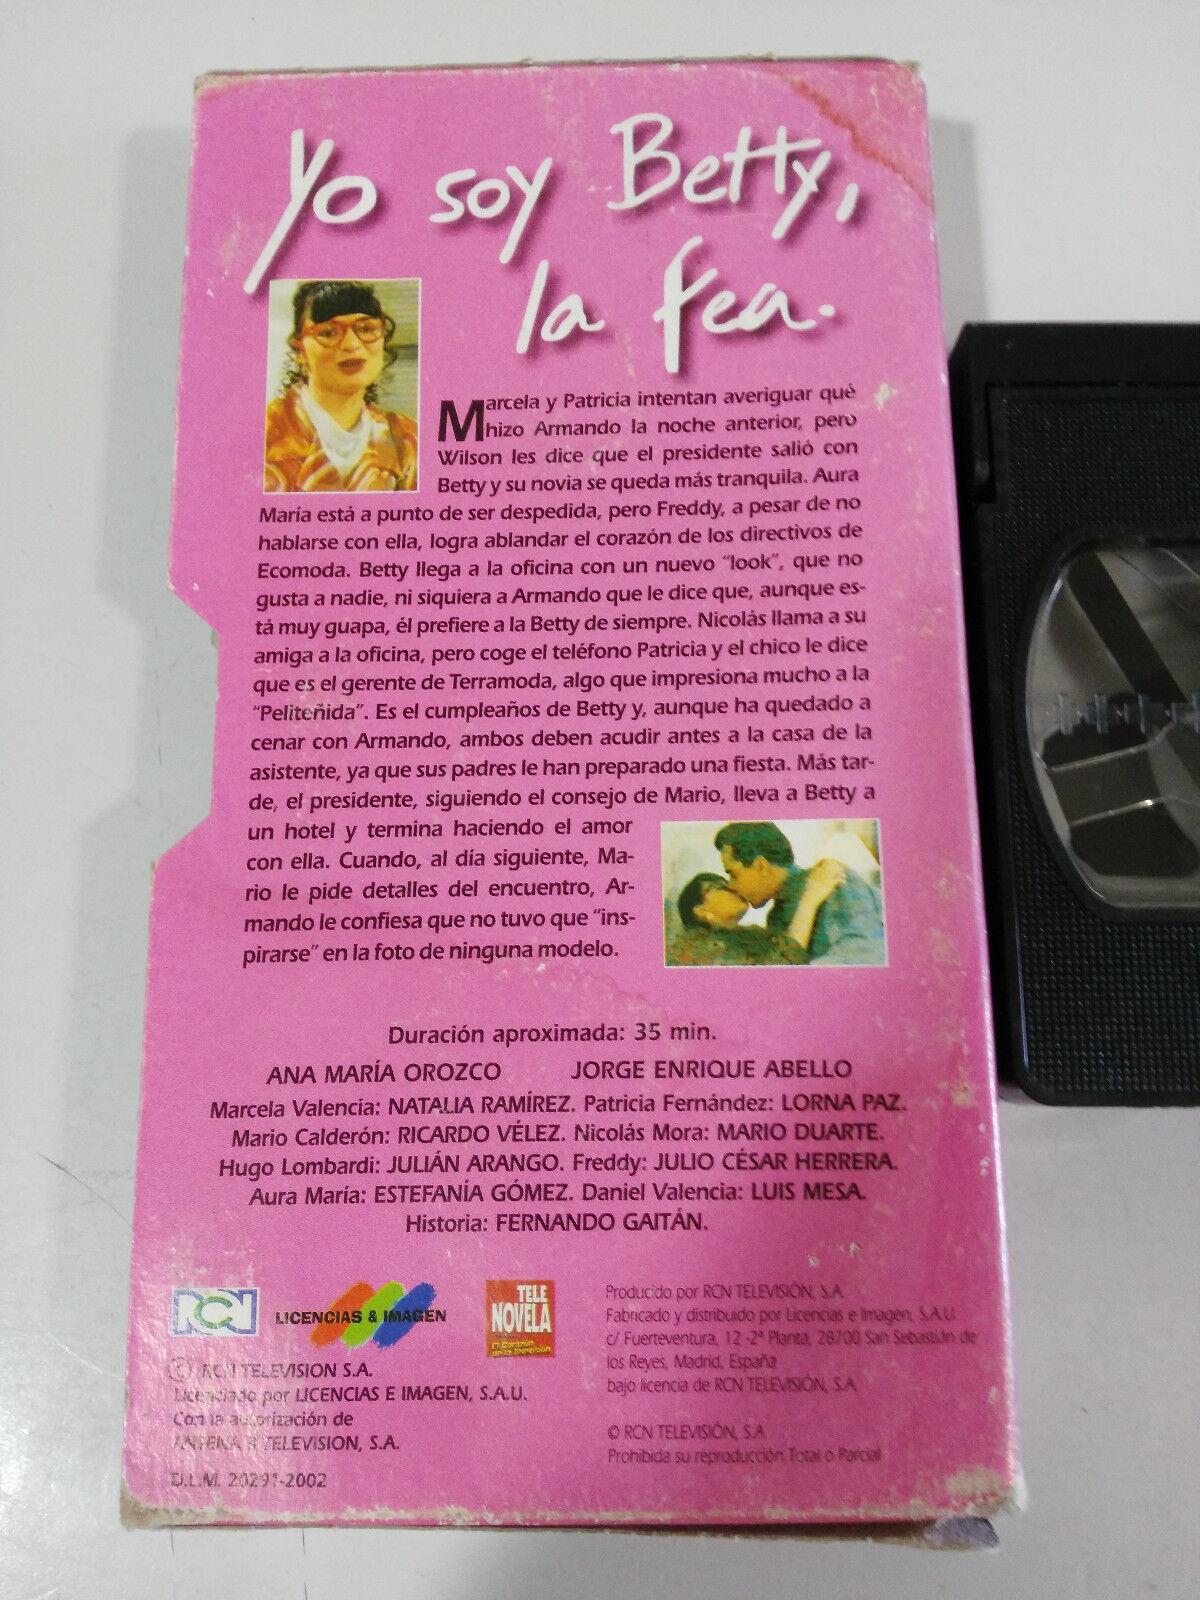 Yo Soy Ugly Betty Volume 6 Ana Maria Orozco Tele Novel VHS Tape Spanish